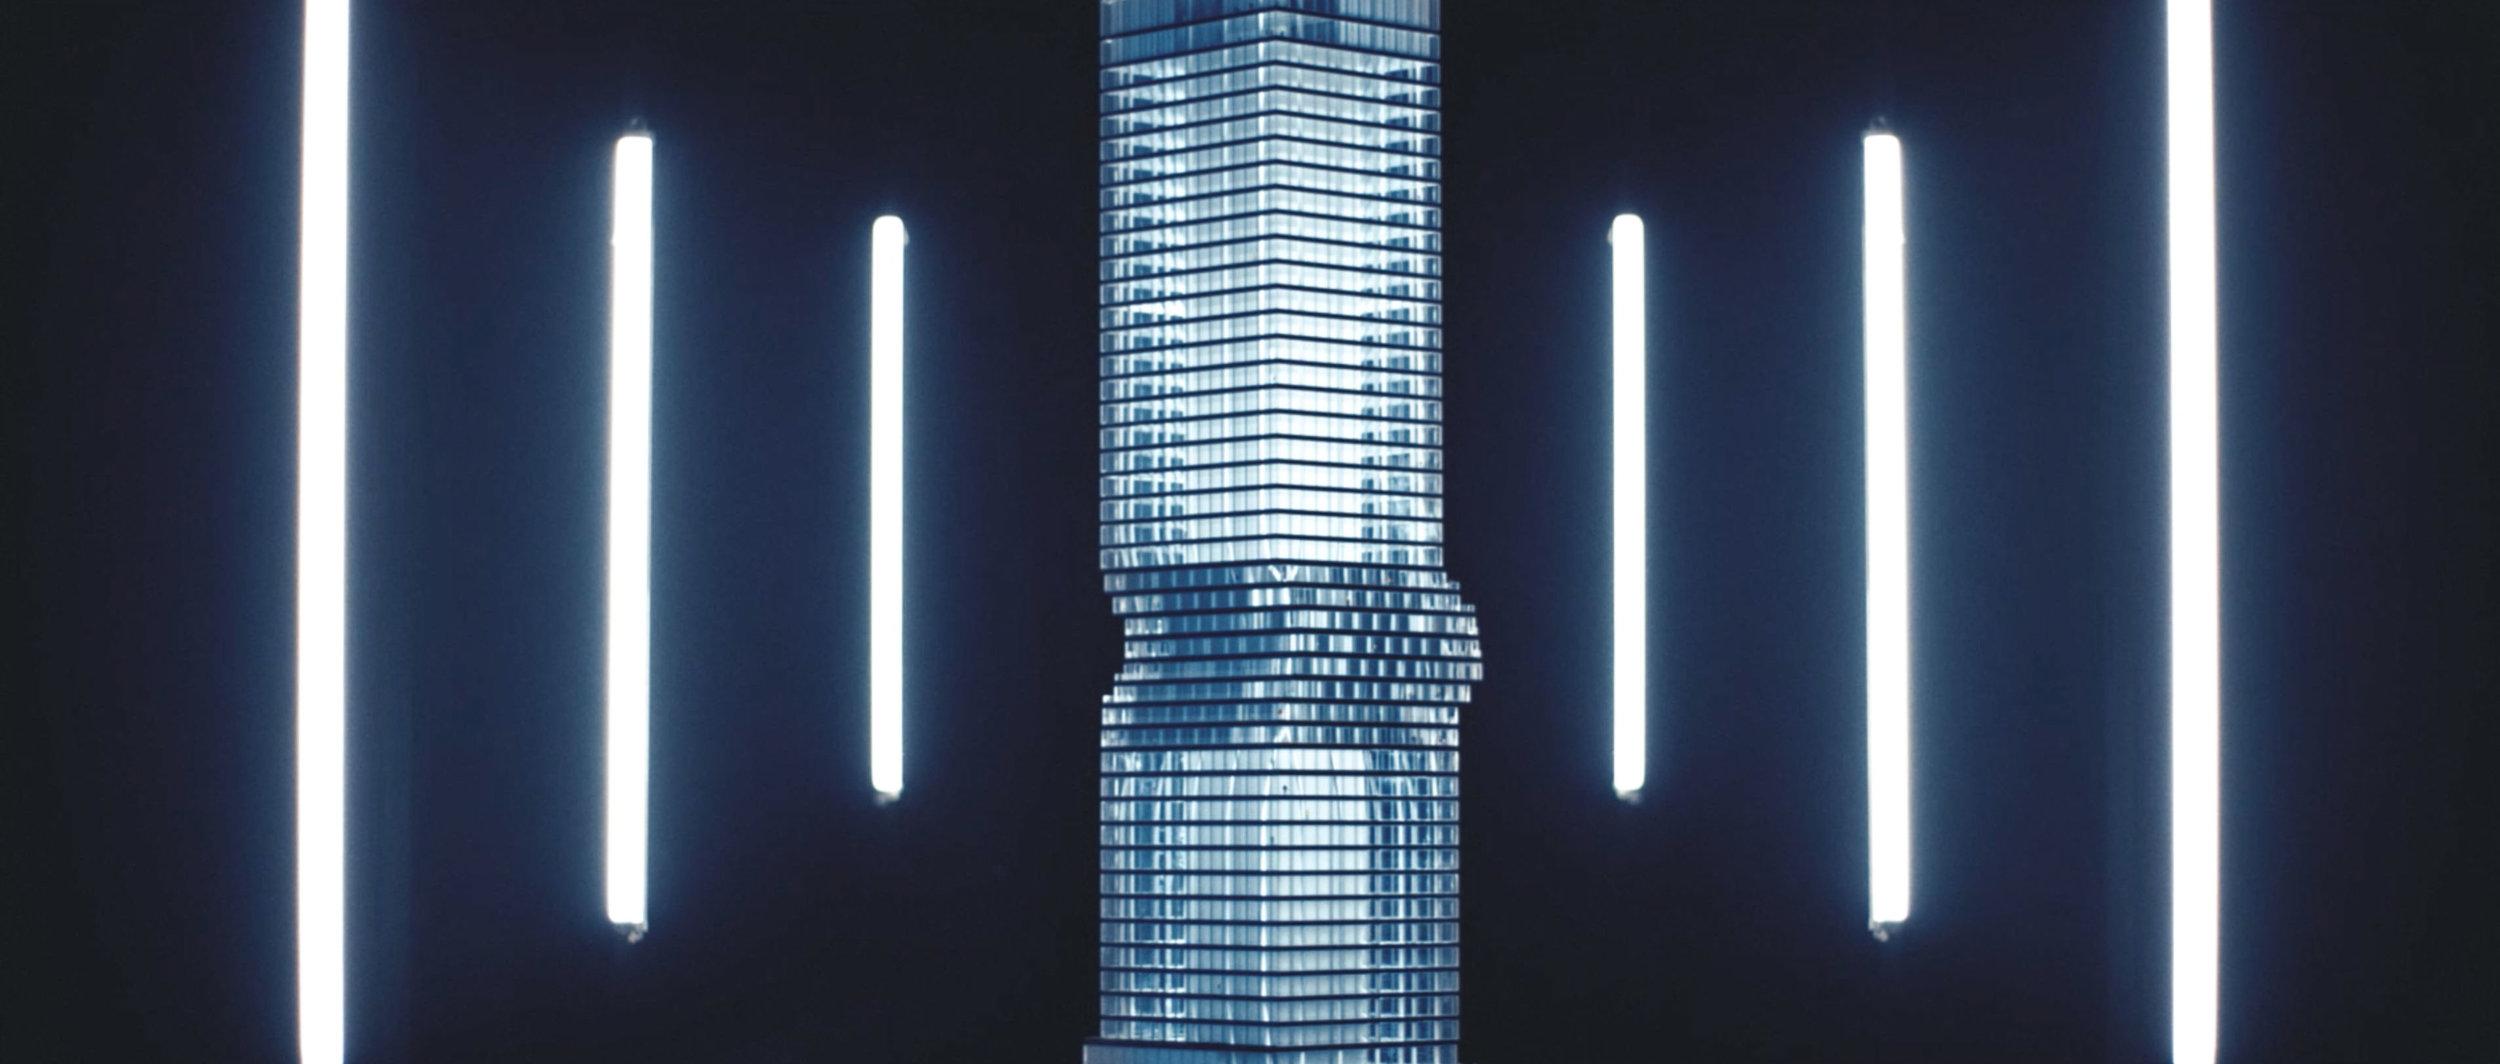 Omniturm-Frankfurt-Tishman-Speyer-Architecture-Idea-Art-City_01.jpg